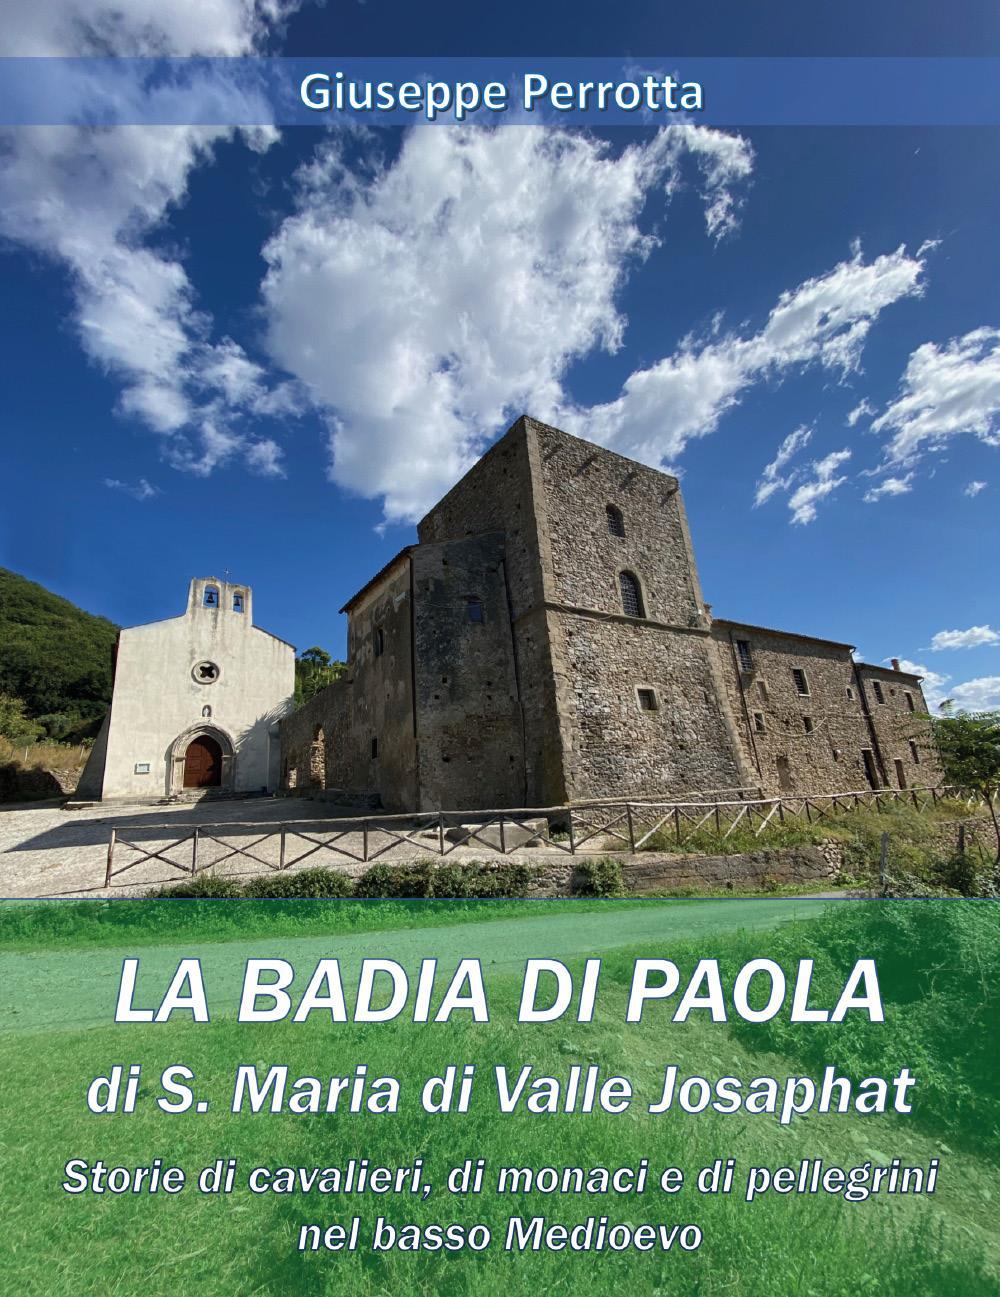 La Badia di Paola di S. Maria di Valle Josaphat